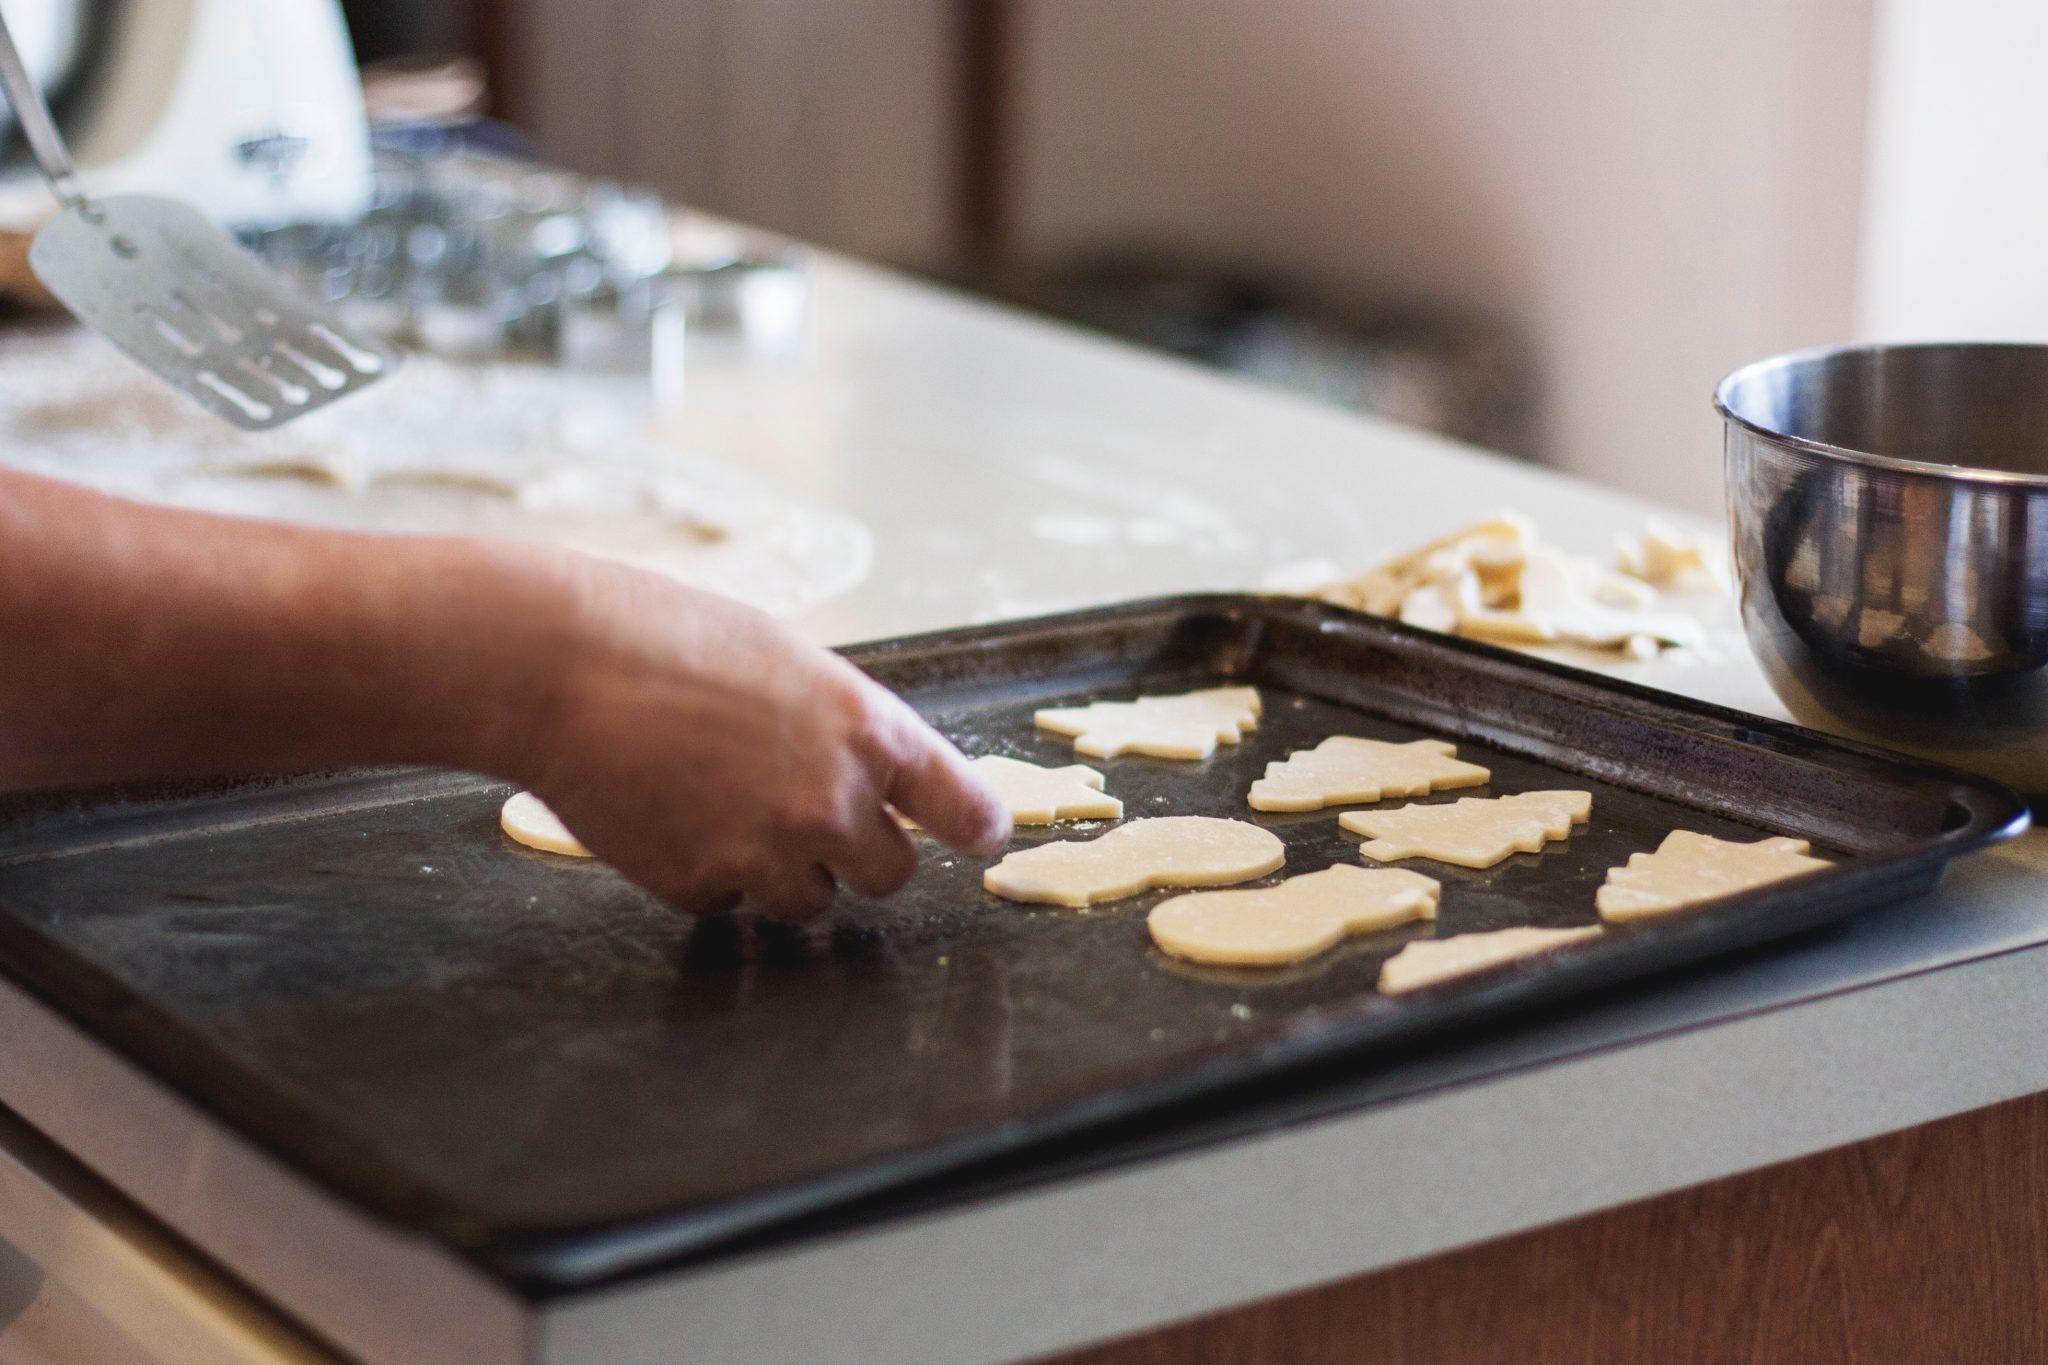 cookie sheet Photo by Kari Shea on Unsplash